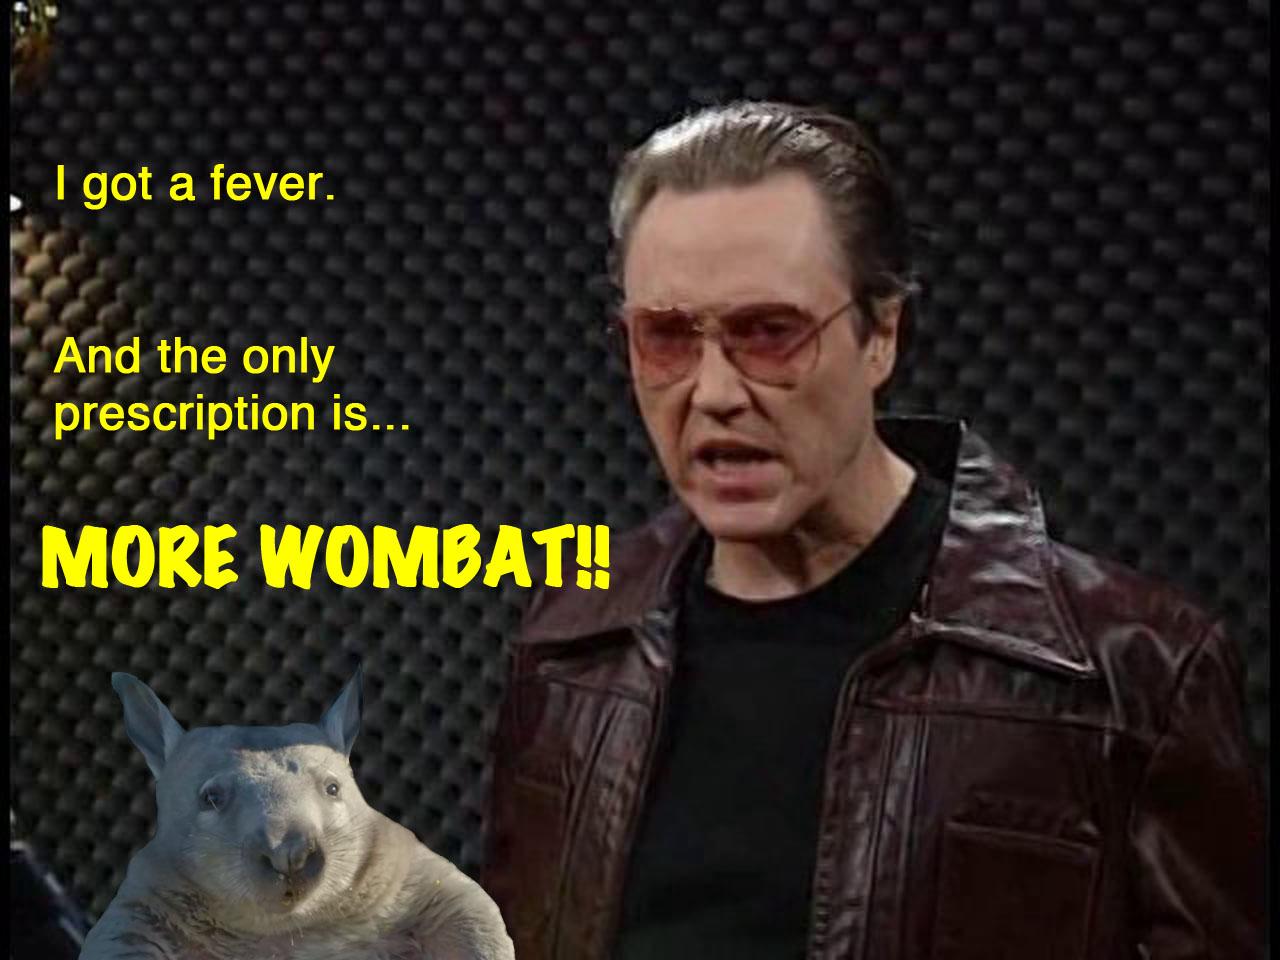 More wombat!